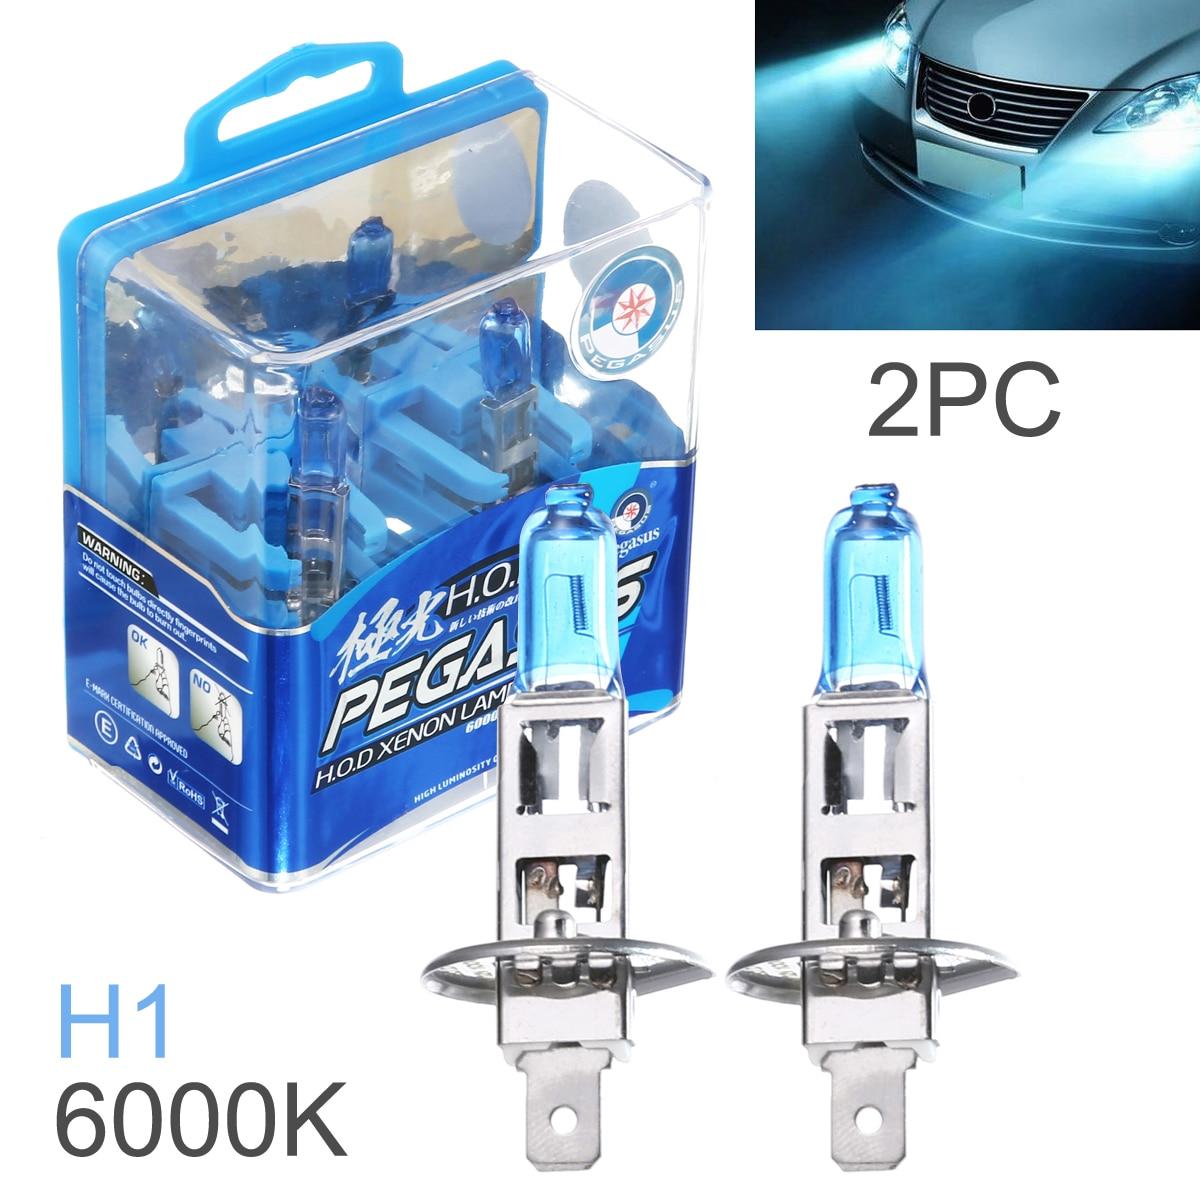 2 Pcs Universal H1 H3 100W 6000K White Light Super Bright Car HOD Halogen Lamp Auto Front Headlight Fog Bulb Fit For Cars